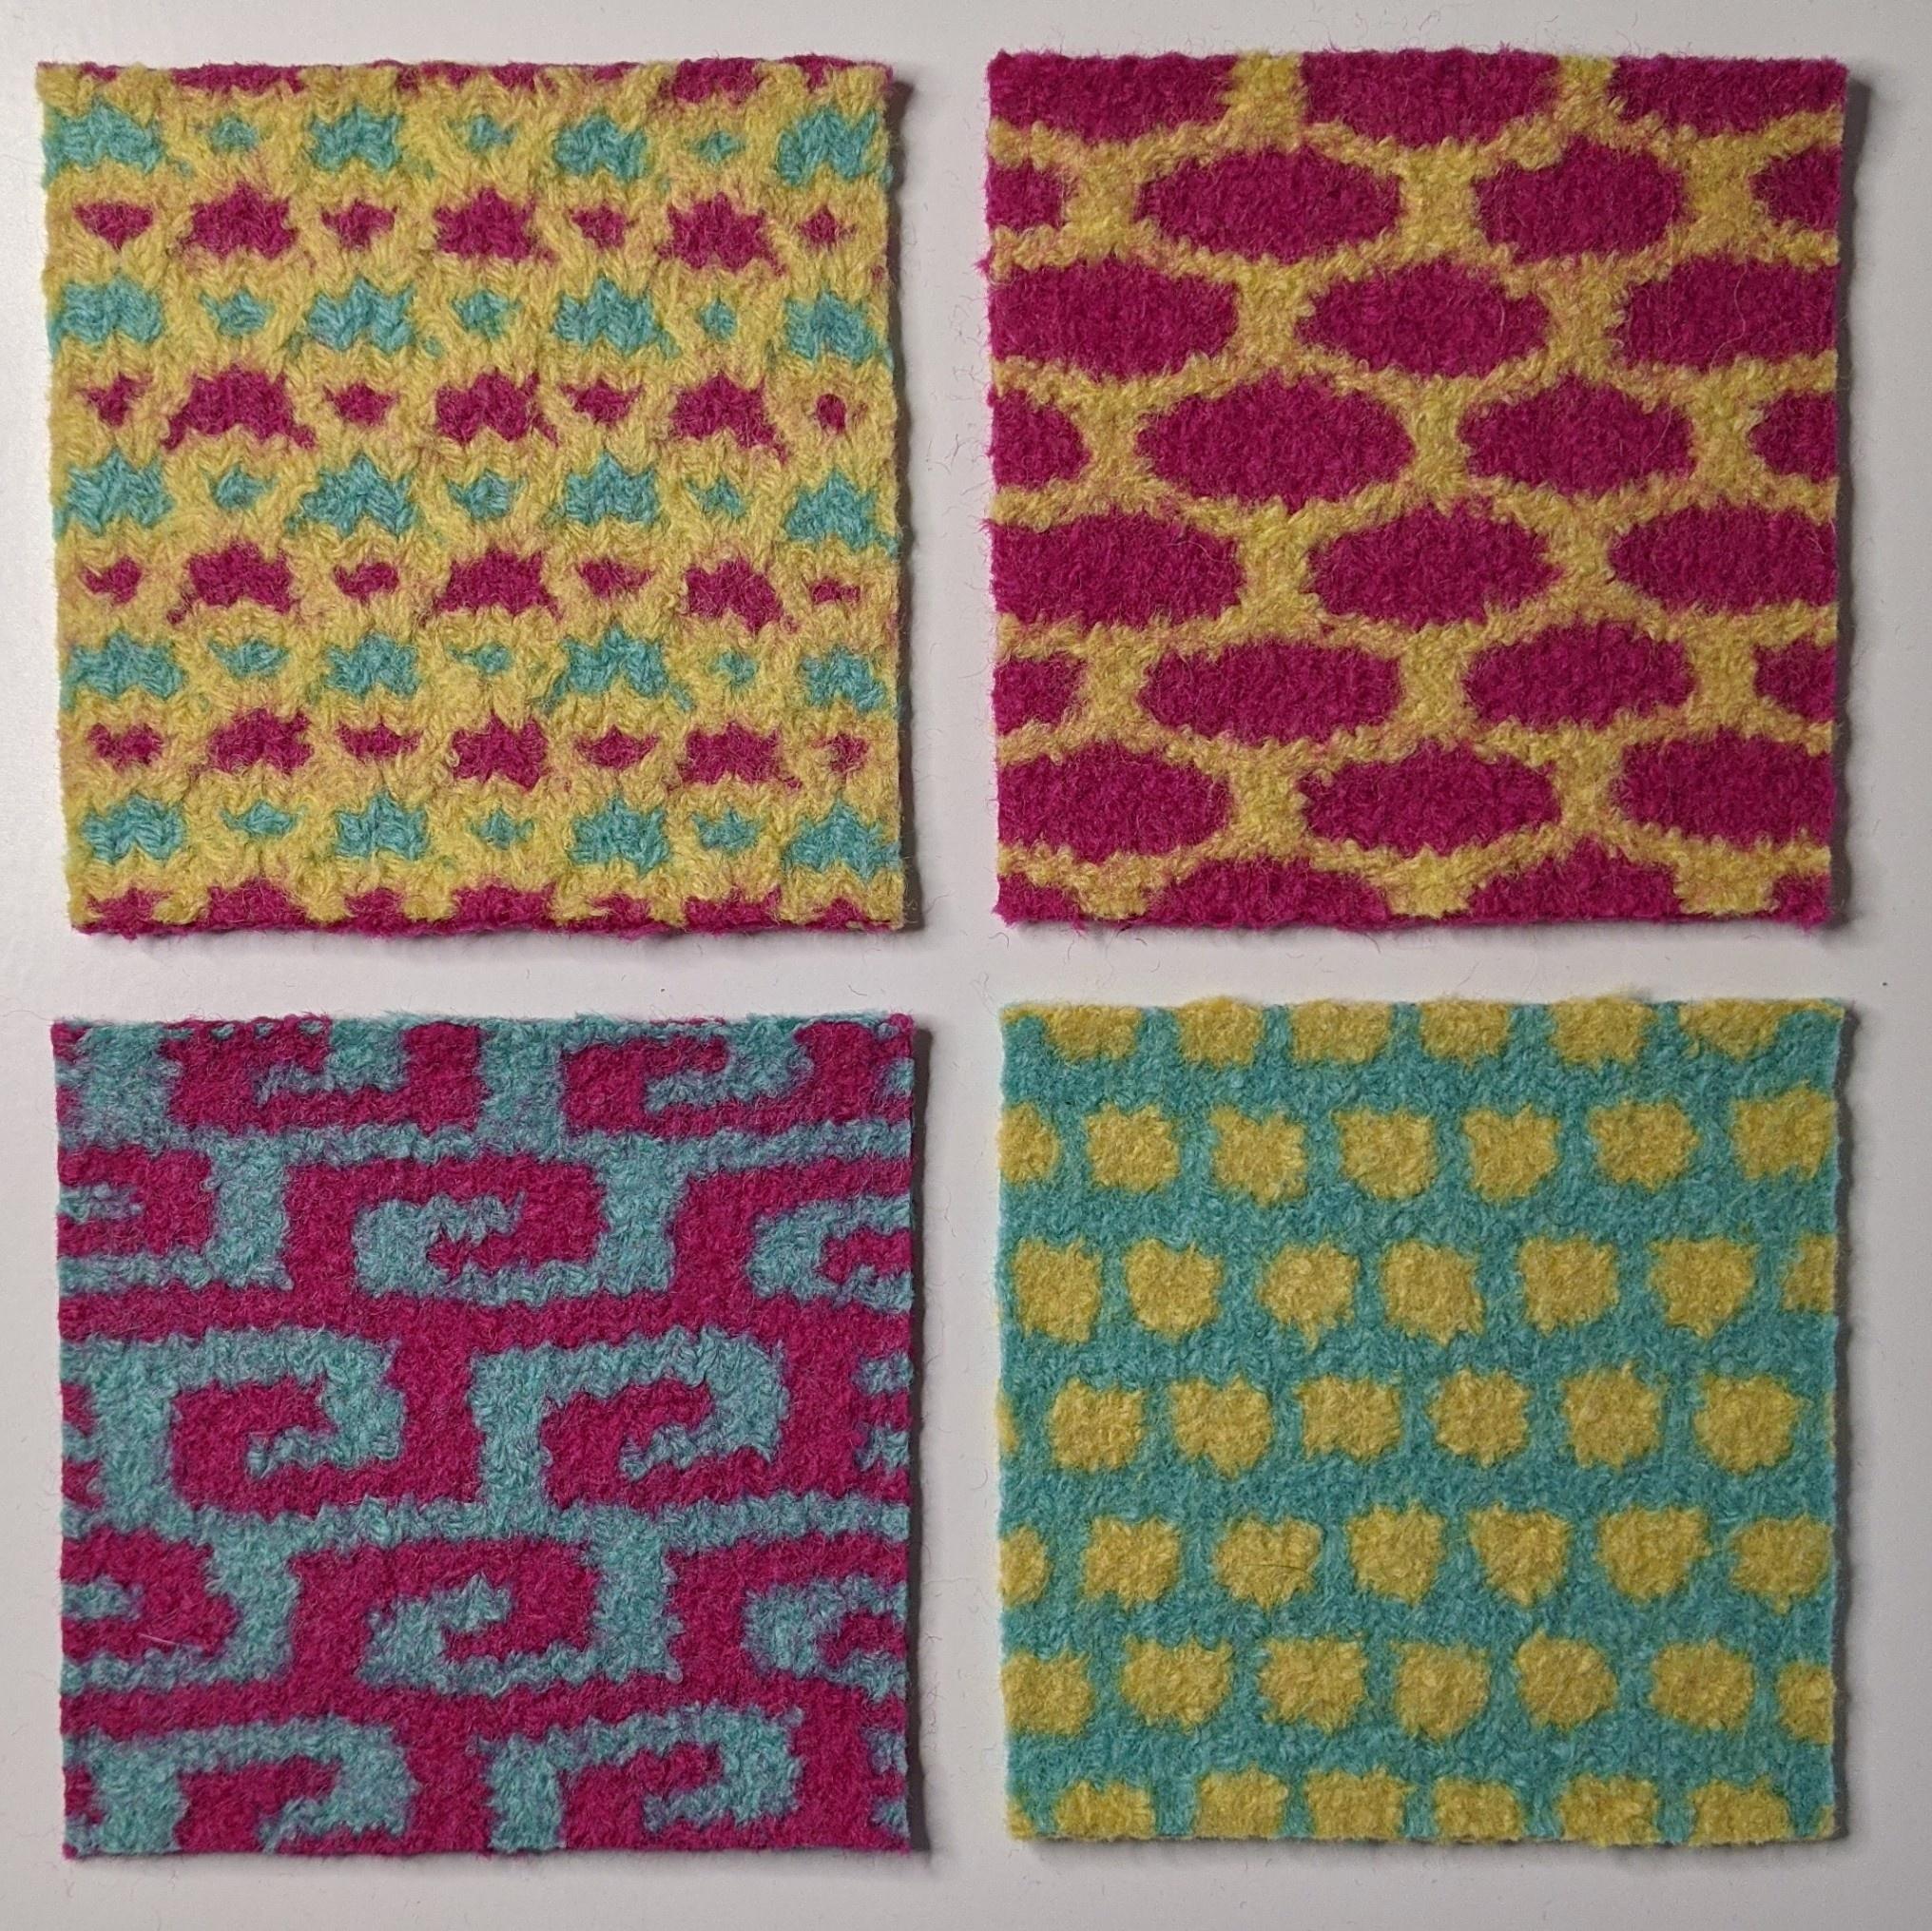 Beyond the Basics: Mosaic Knitting - Online via Zoom